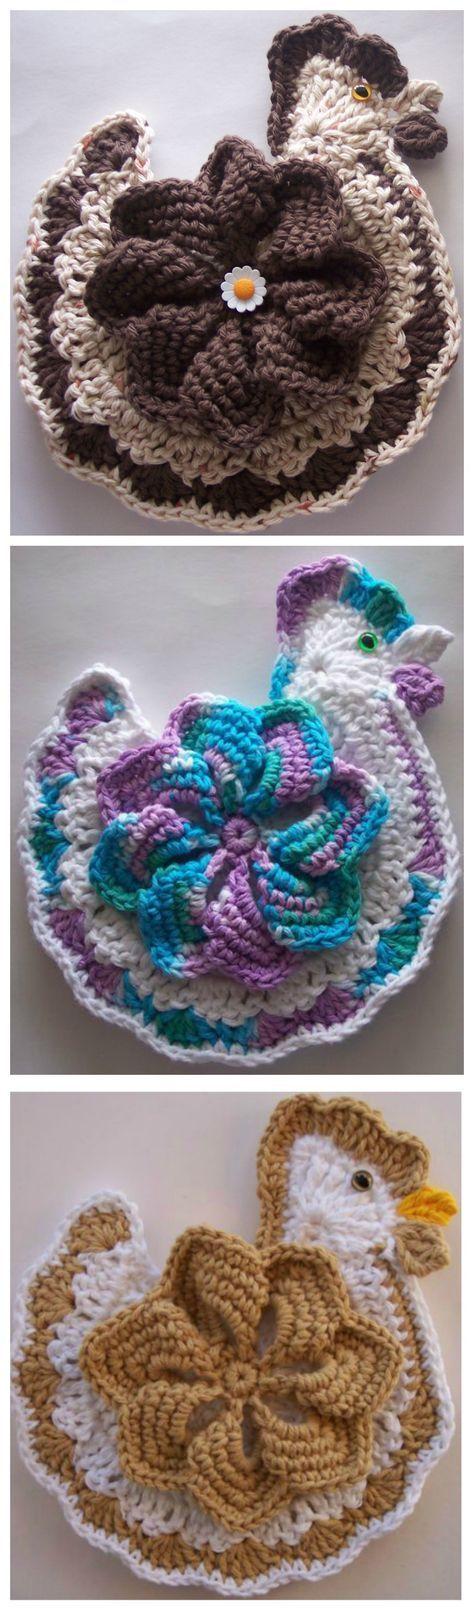 Crochet Chicken Potholder | Pinterest | Topflappen, Häkeln ideen und ...